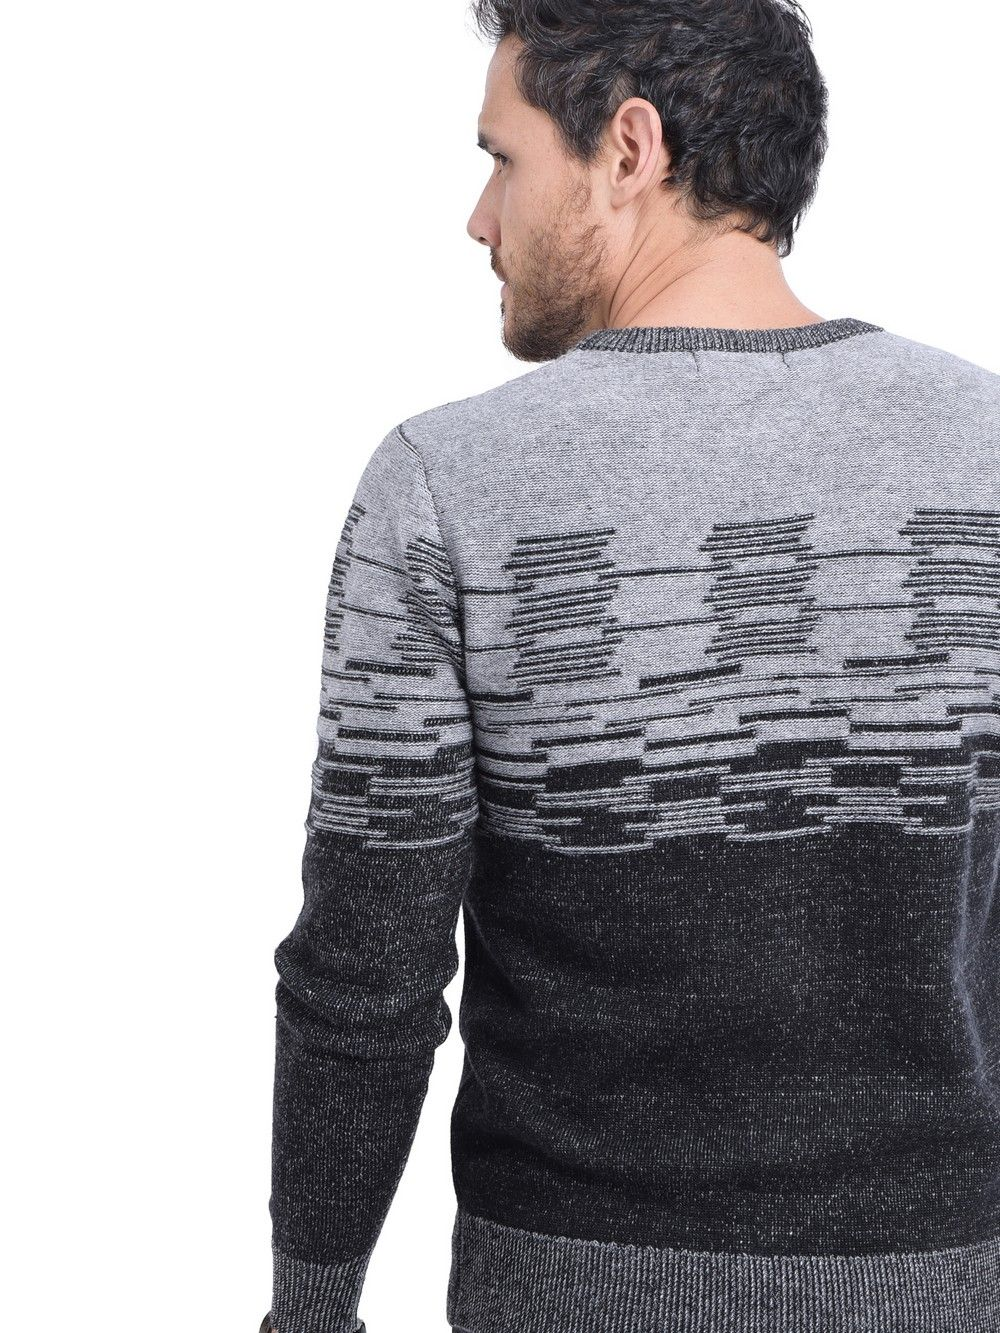 C&JO Round Neck 3-ply Jacquard Sweater in Black